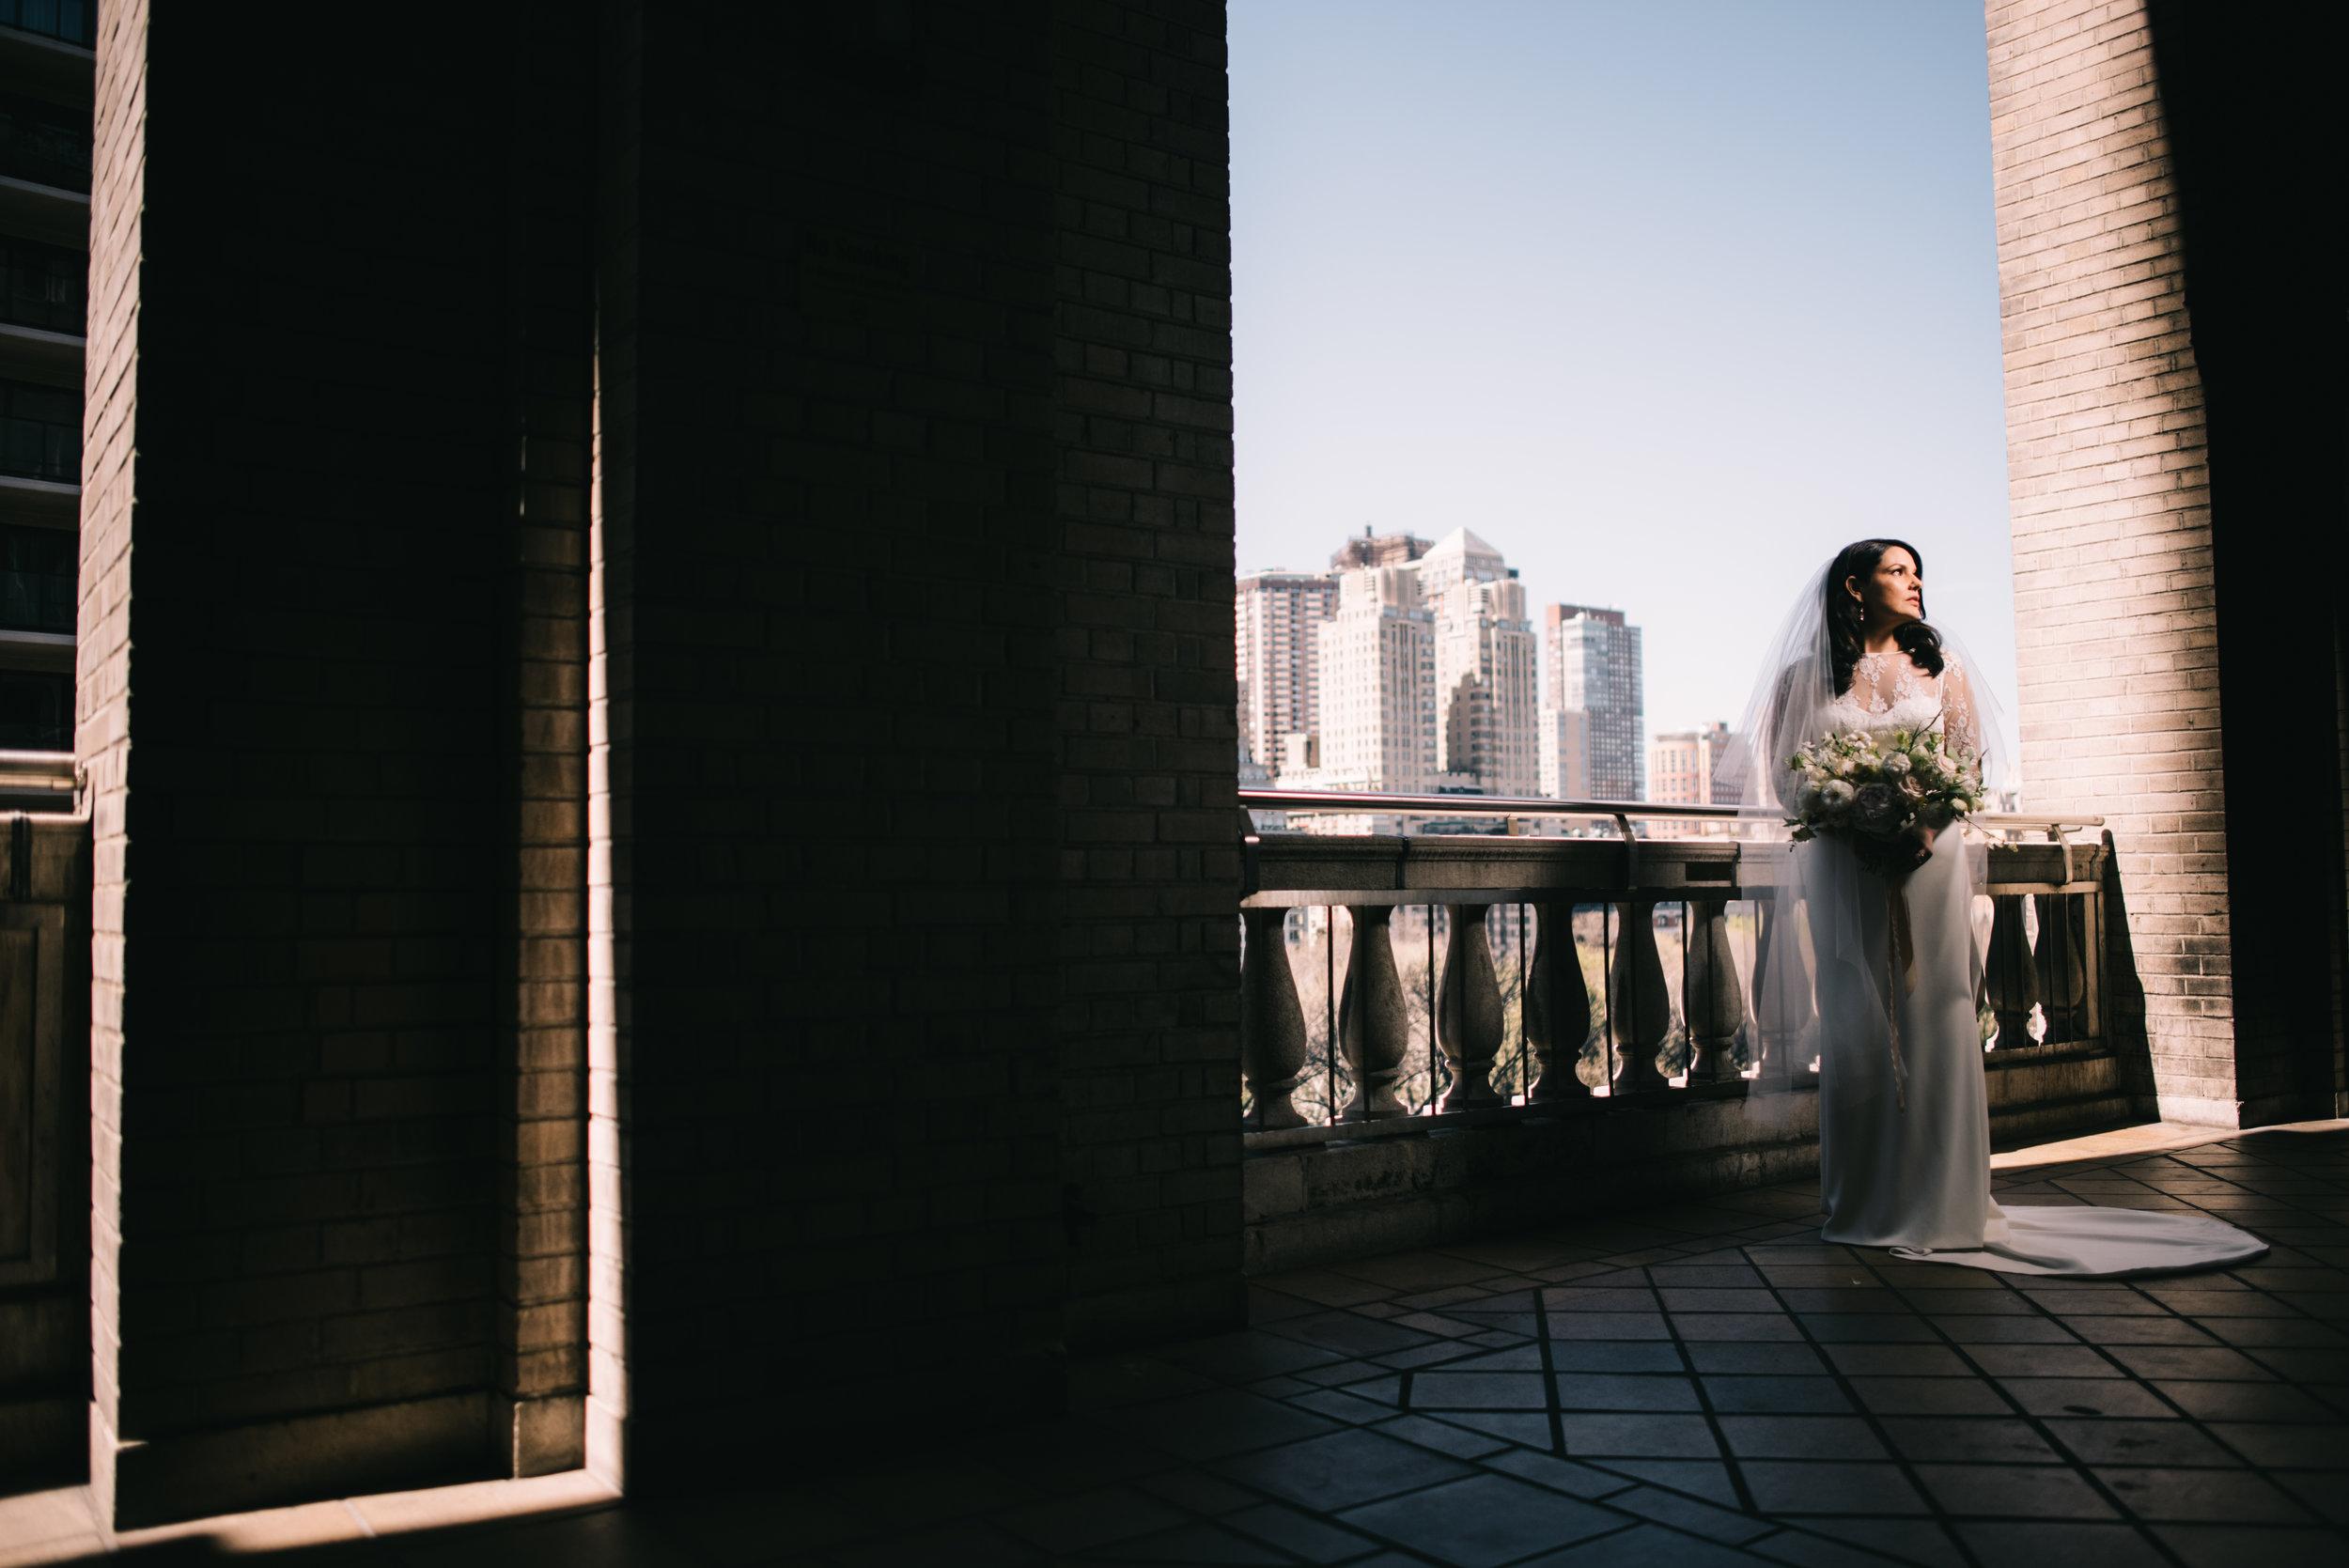 WeddingPhotos | NJPhotographer | Highlights-1-58.jpg